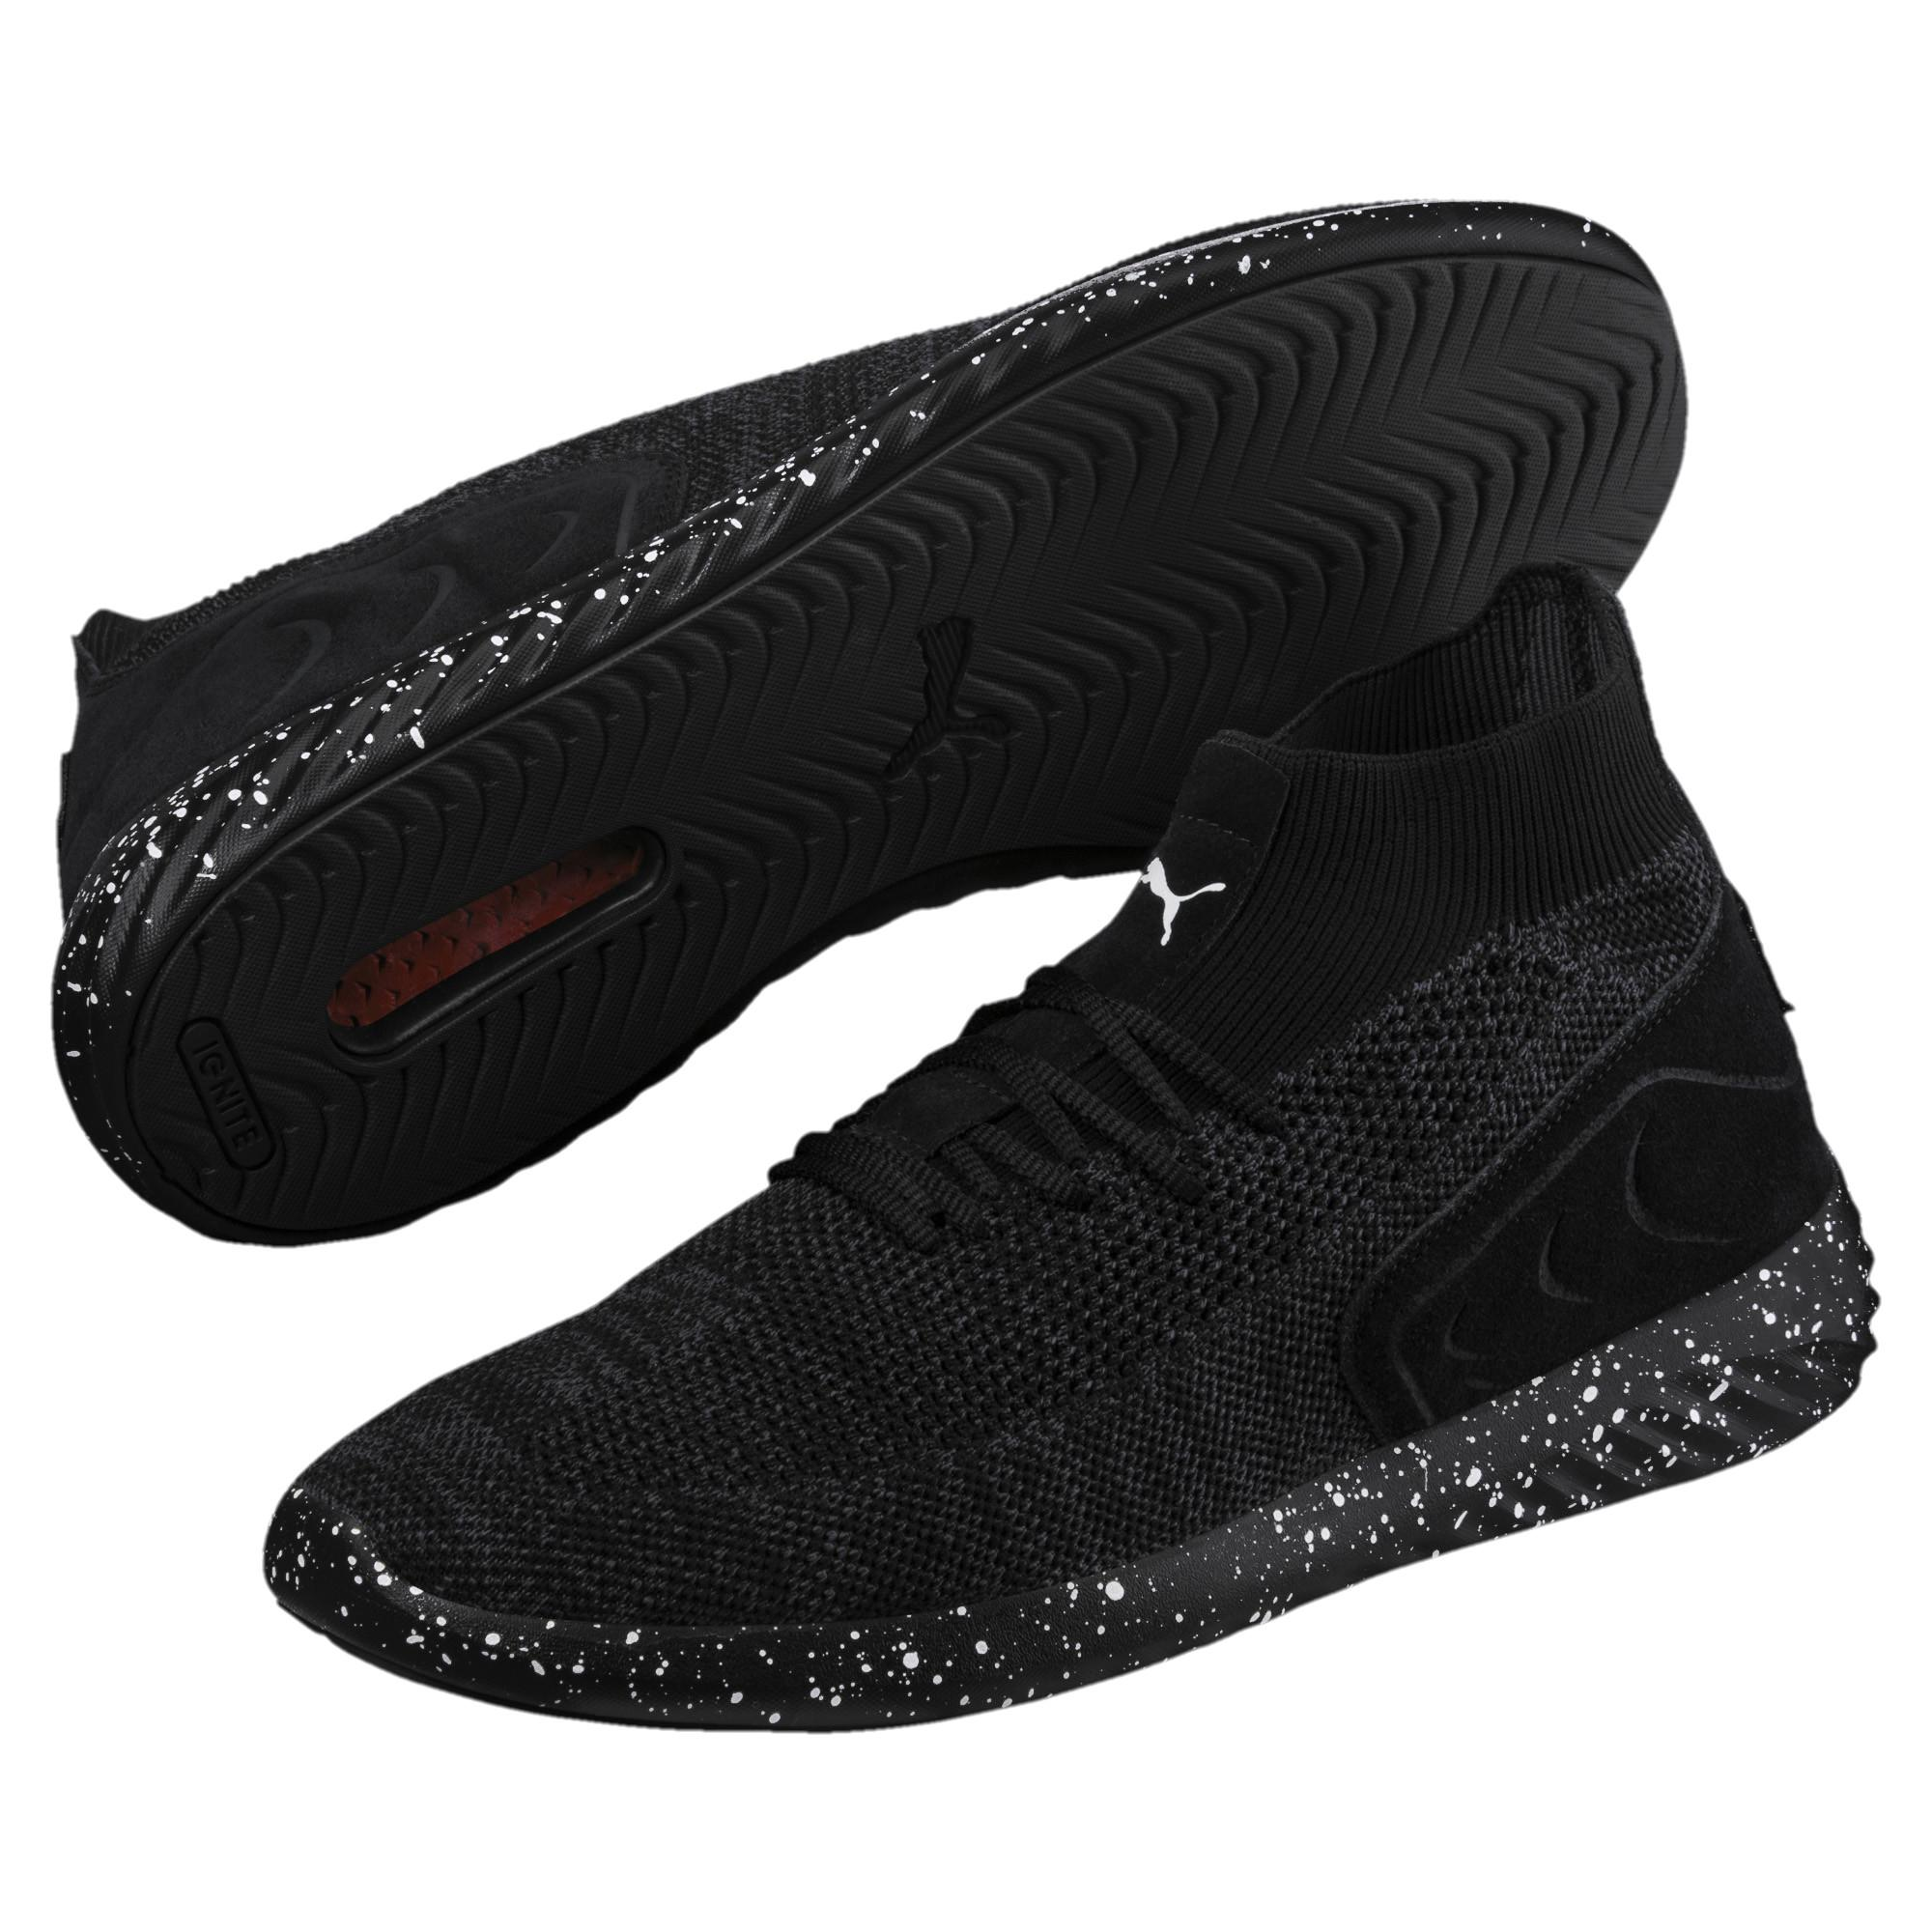 f47132c4d355 PUMA - Black Speed Cat Wings Monaco Shoes for Men - Lyst. View fullscreen